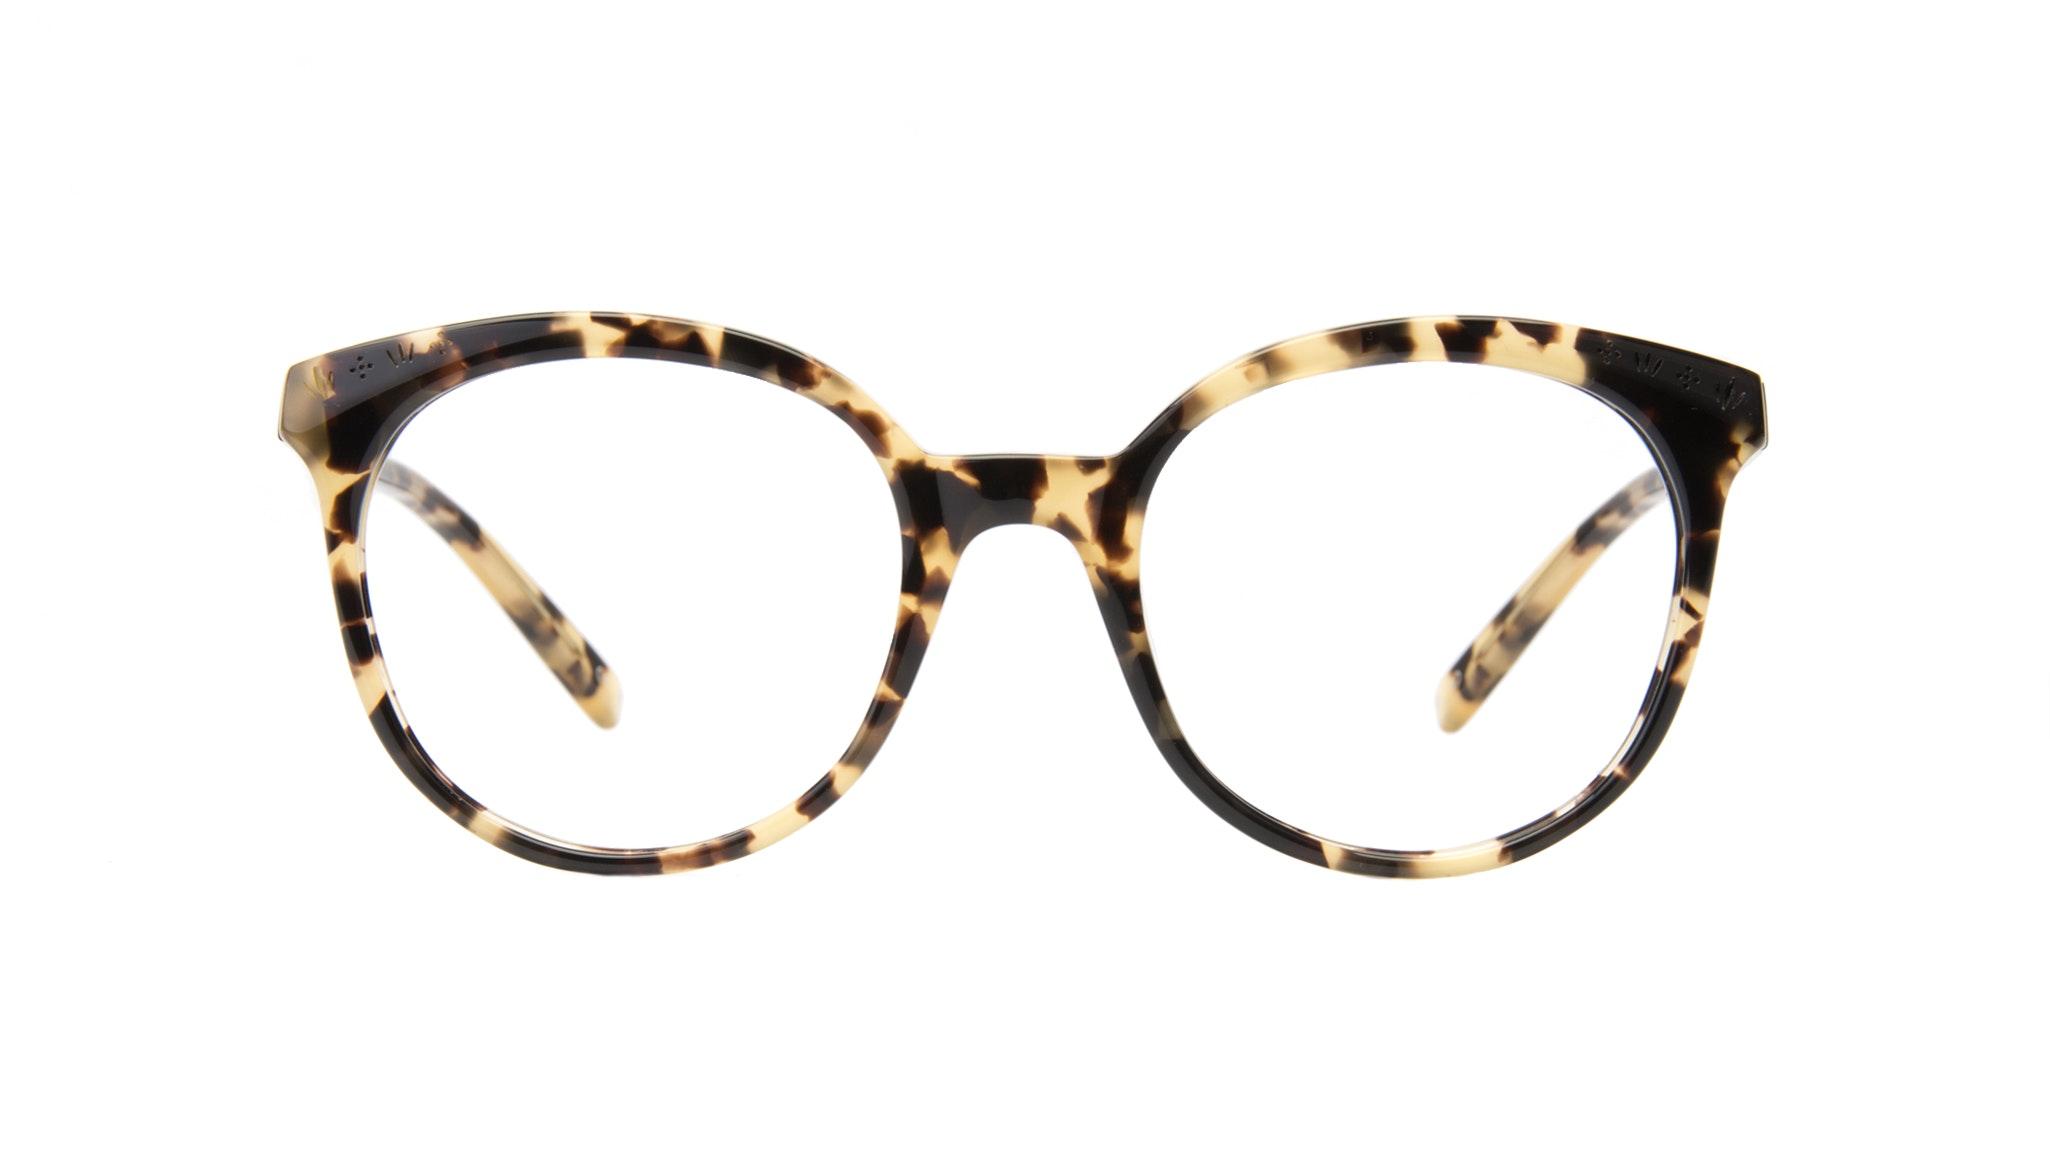 Affordable Fashion Glasses Round Eyeglasses Women Must Tortoise